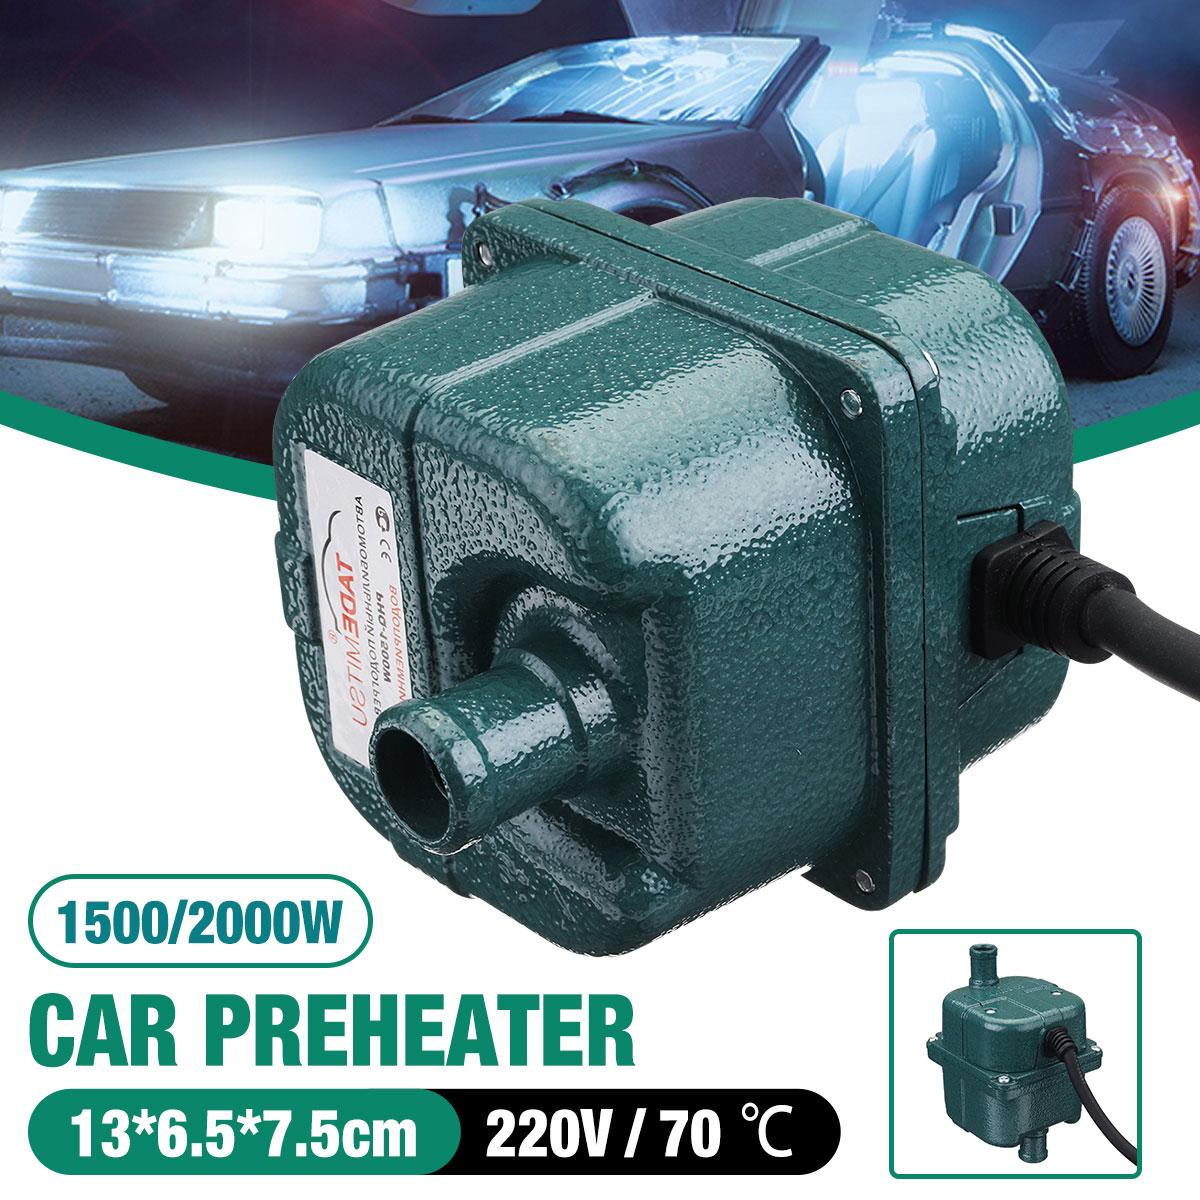 220V 1000 W/1500 W/2000 W bomba de motor de coche Auto tanque de agua enfriado por aire precalentador de motor